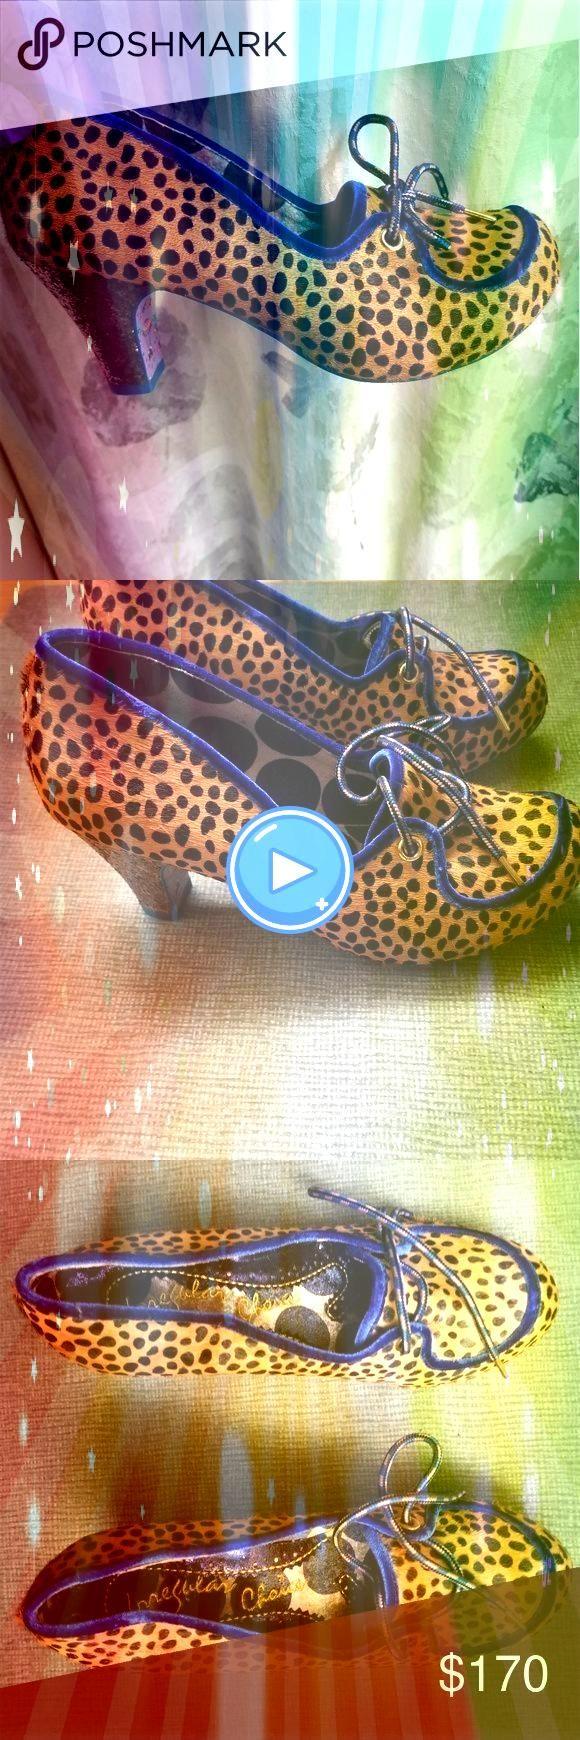 choice leopard heels 3 inch heel calfpony hair glitter heels Irregu Irregular choice leopard heels 3 inch heel calfpony hair glitter heels Irregu Irregular choice leopard...